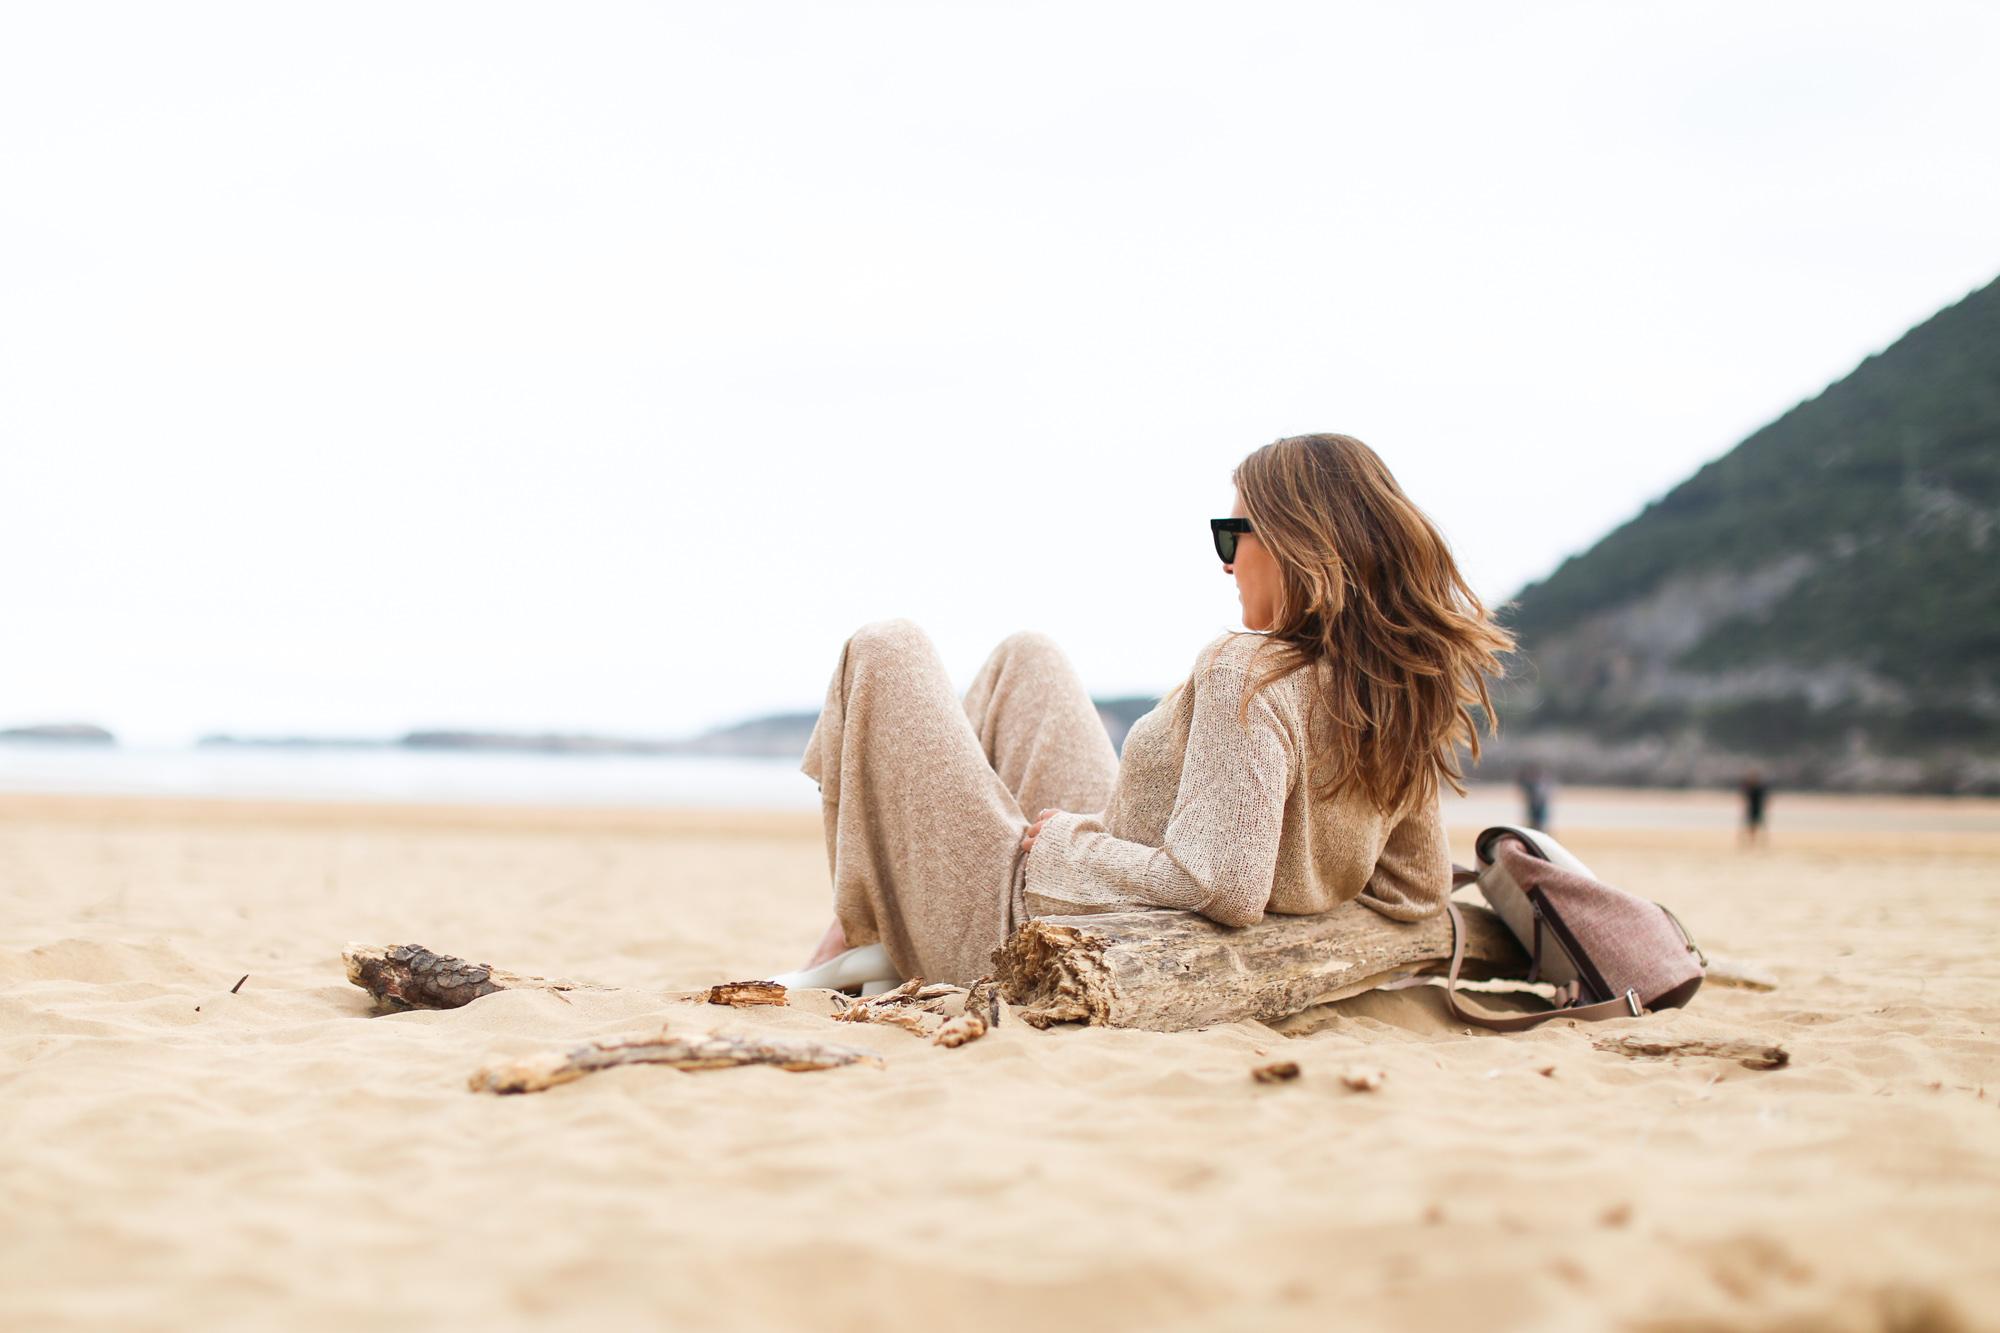 Clochet_pantalon_culotte_Zara_punto_verano-2